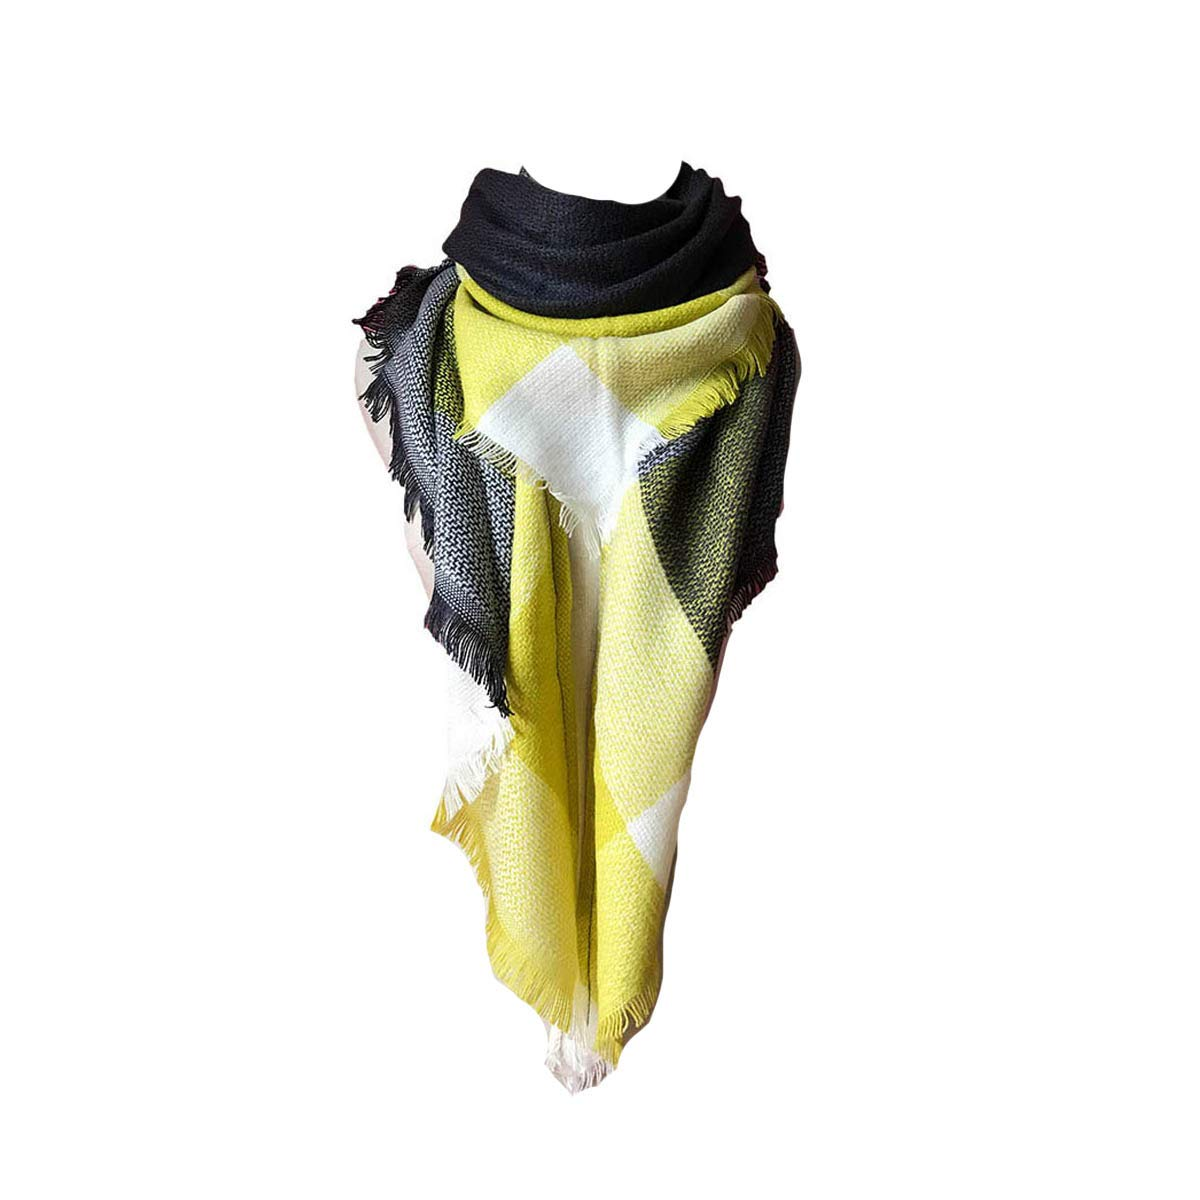 500138748a8eeb heekpek Moda Nappe Morbido Donne Sciarpa Avvolgere Scialle Scarf Wrap Caldo  Modello Lattice Scialle Stole con